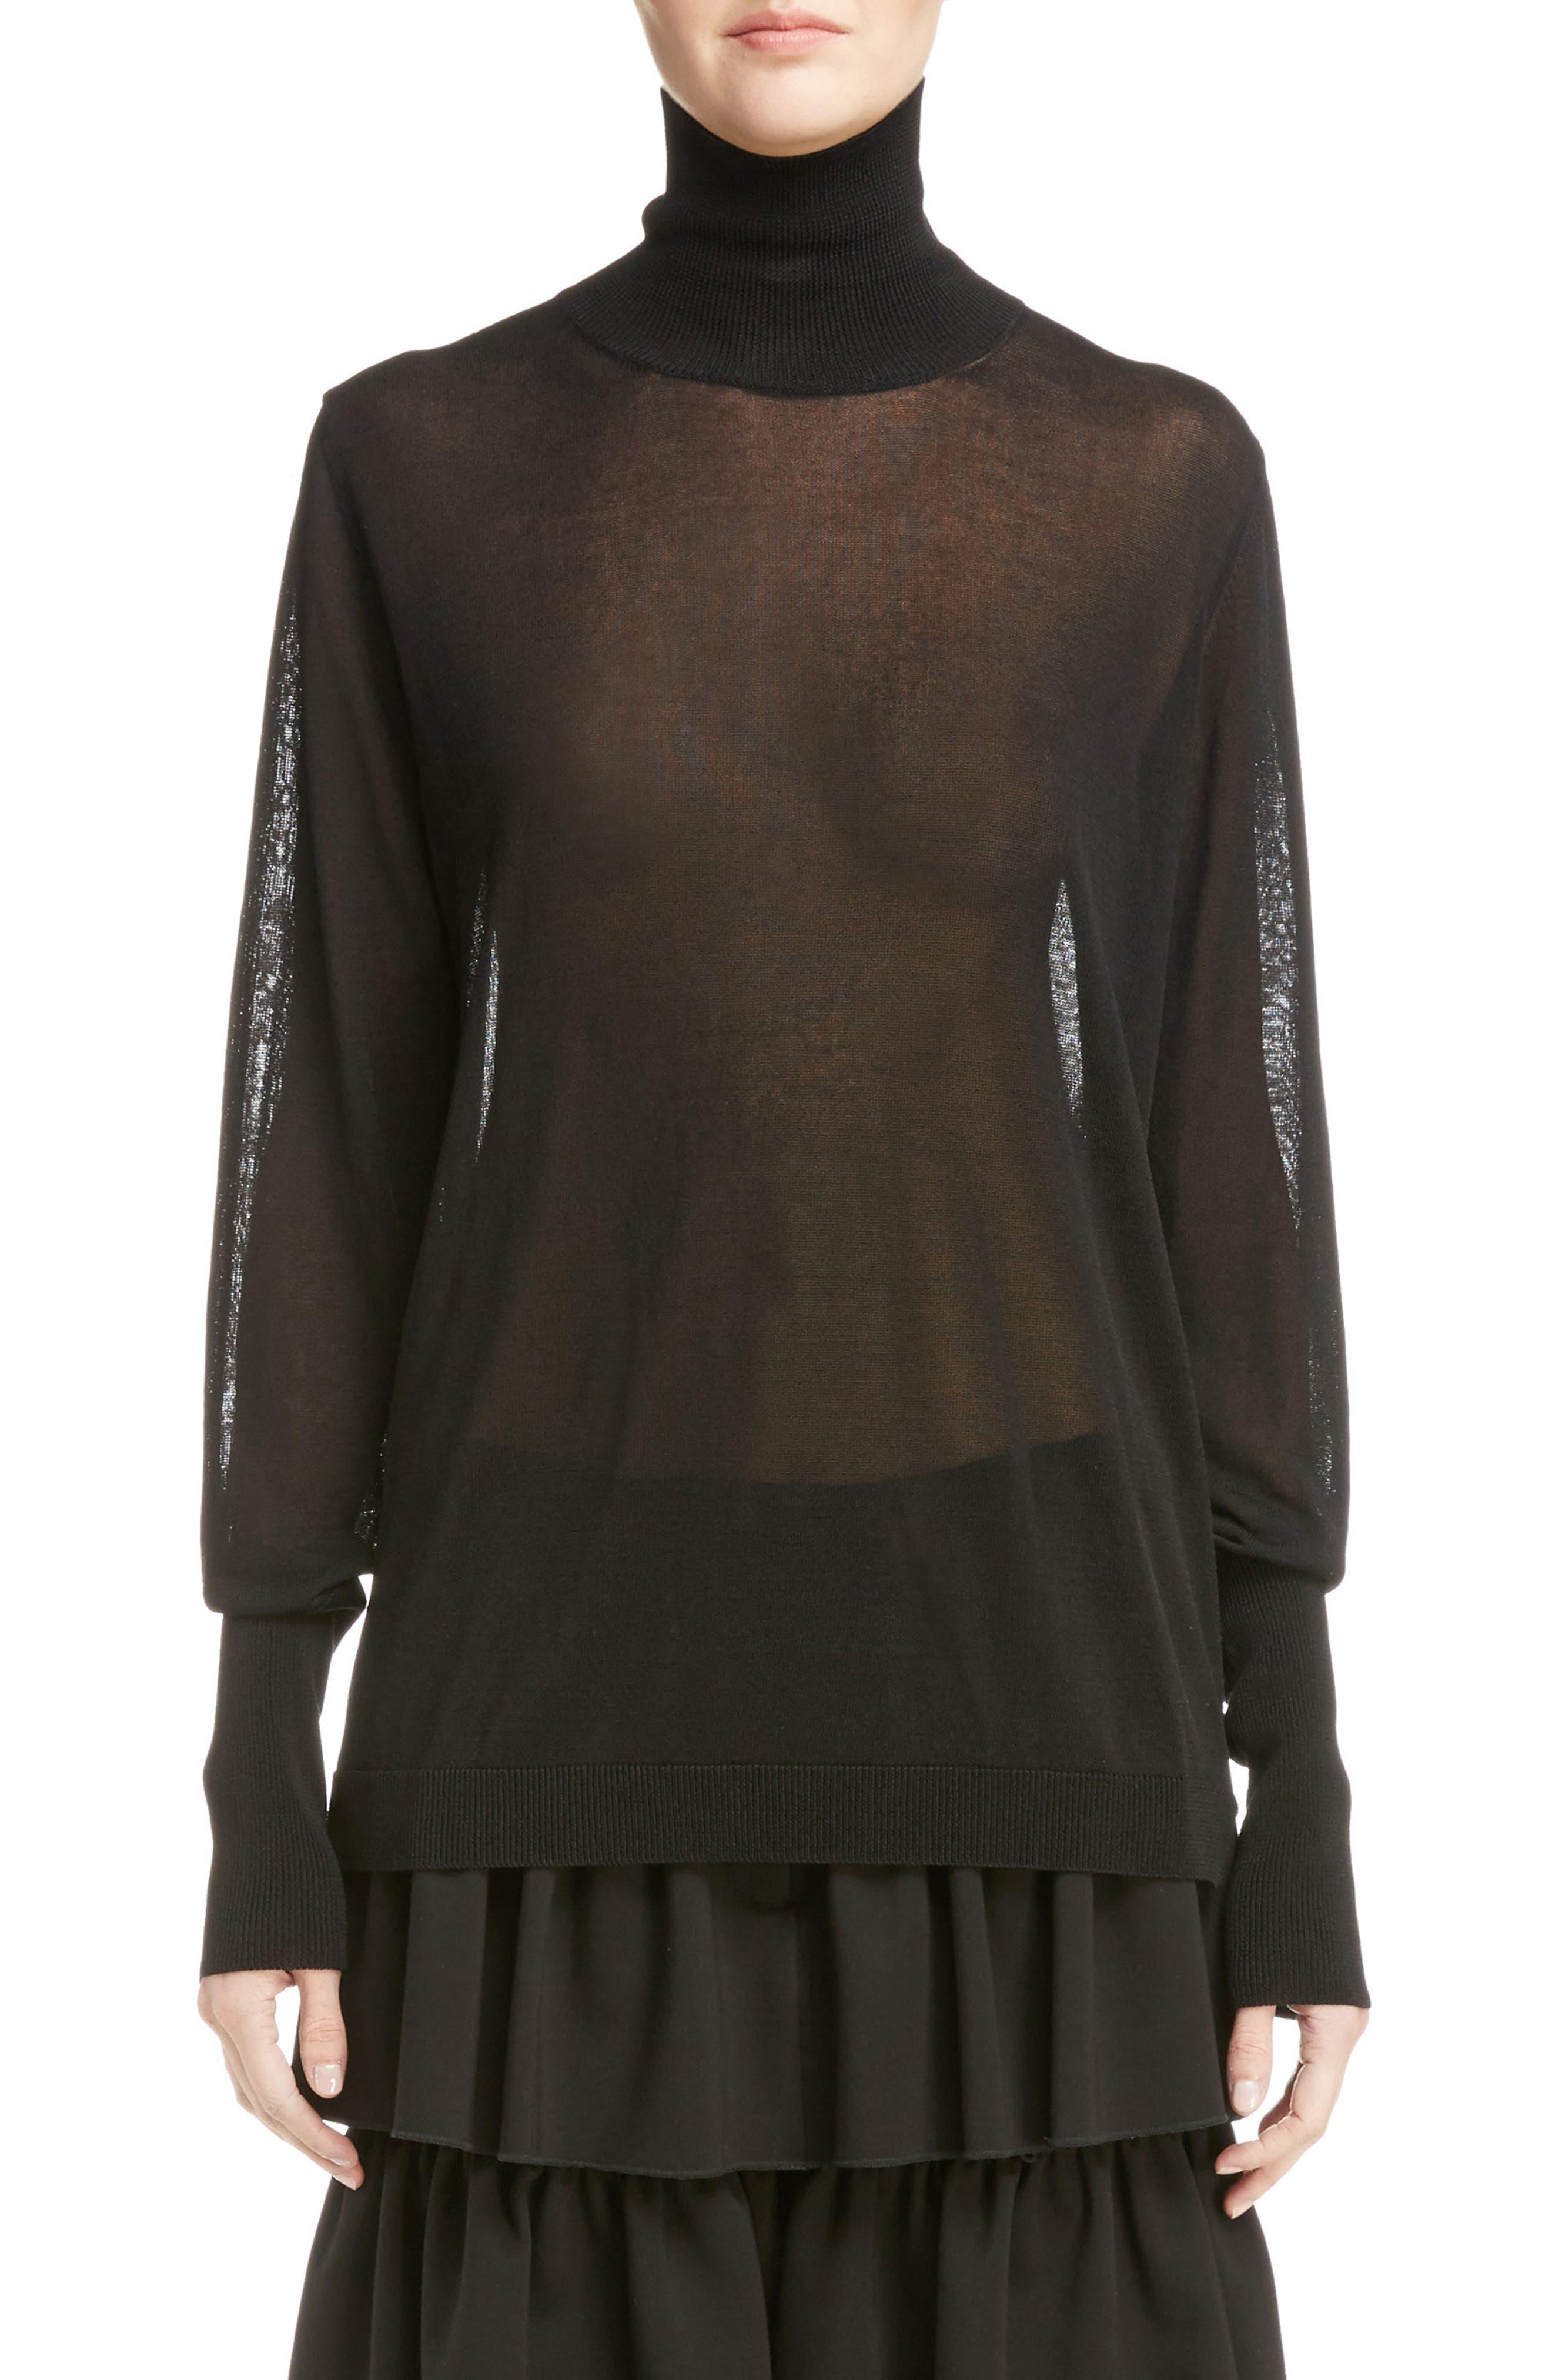 Alternate Image 1 Selected - Simone Rocha Sheer Mock Neck Sweater